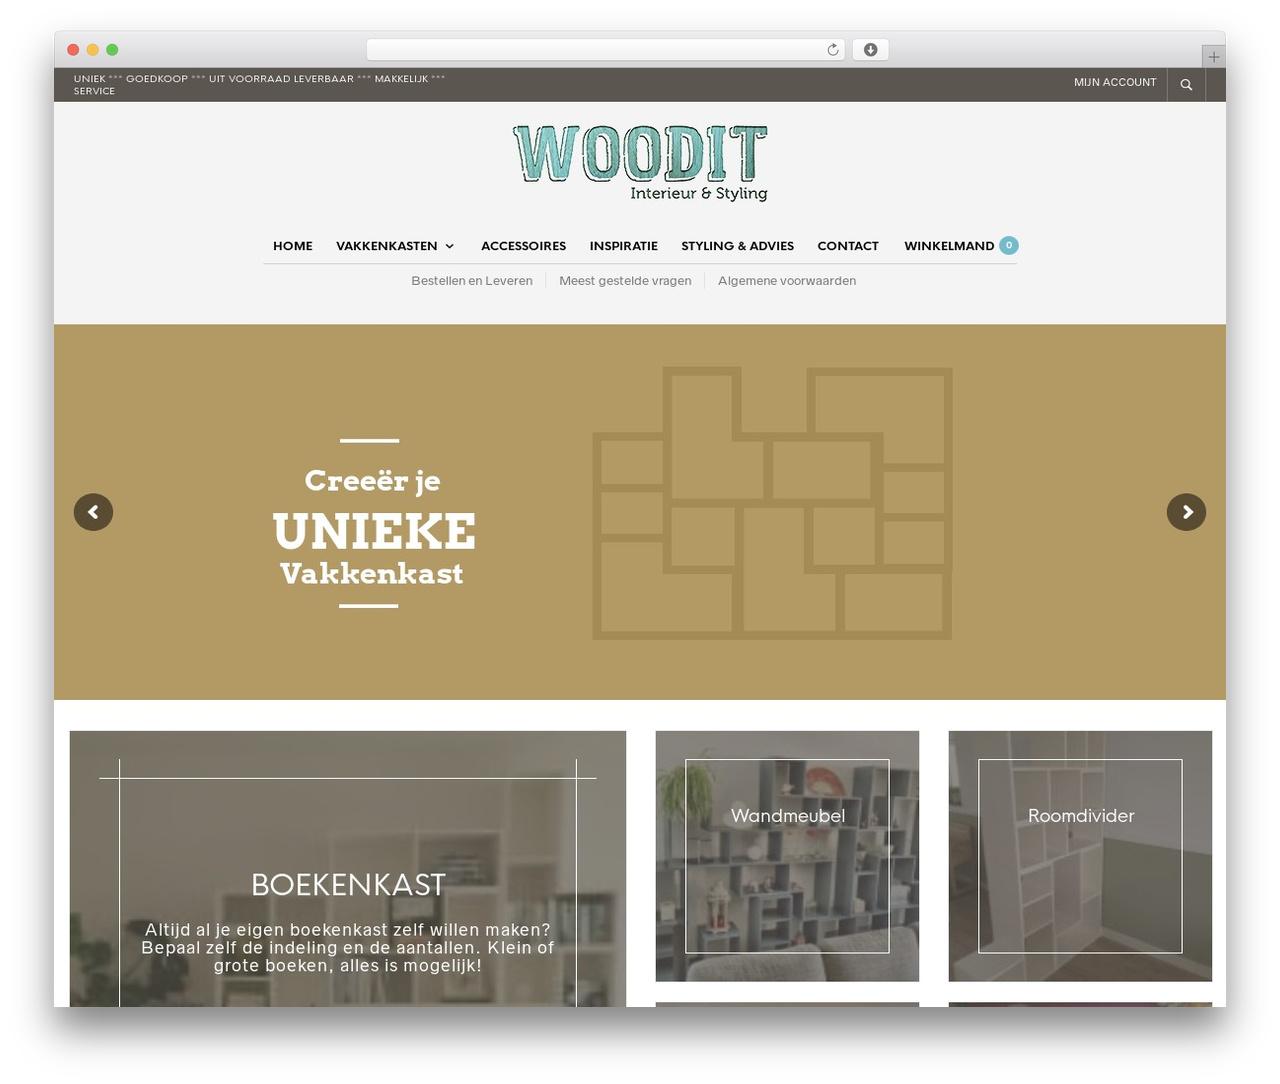 WP theme The Retailer - woodit.nl